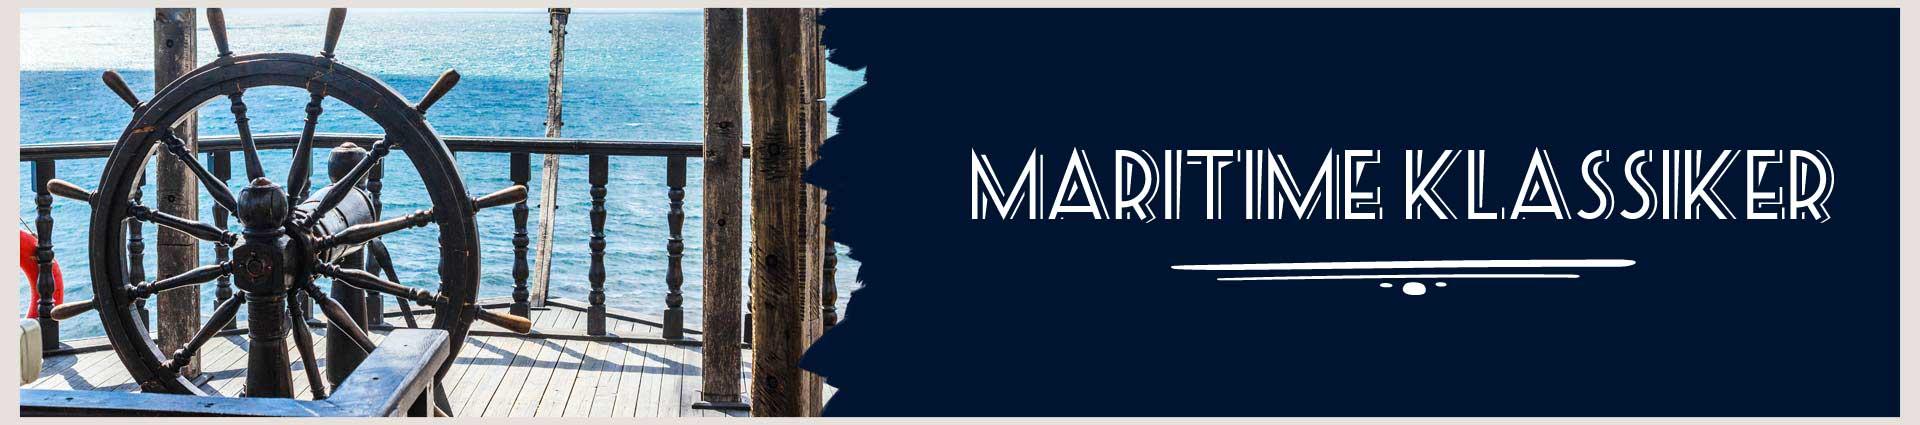 Maritime Klassiker Banner